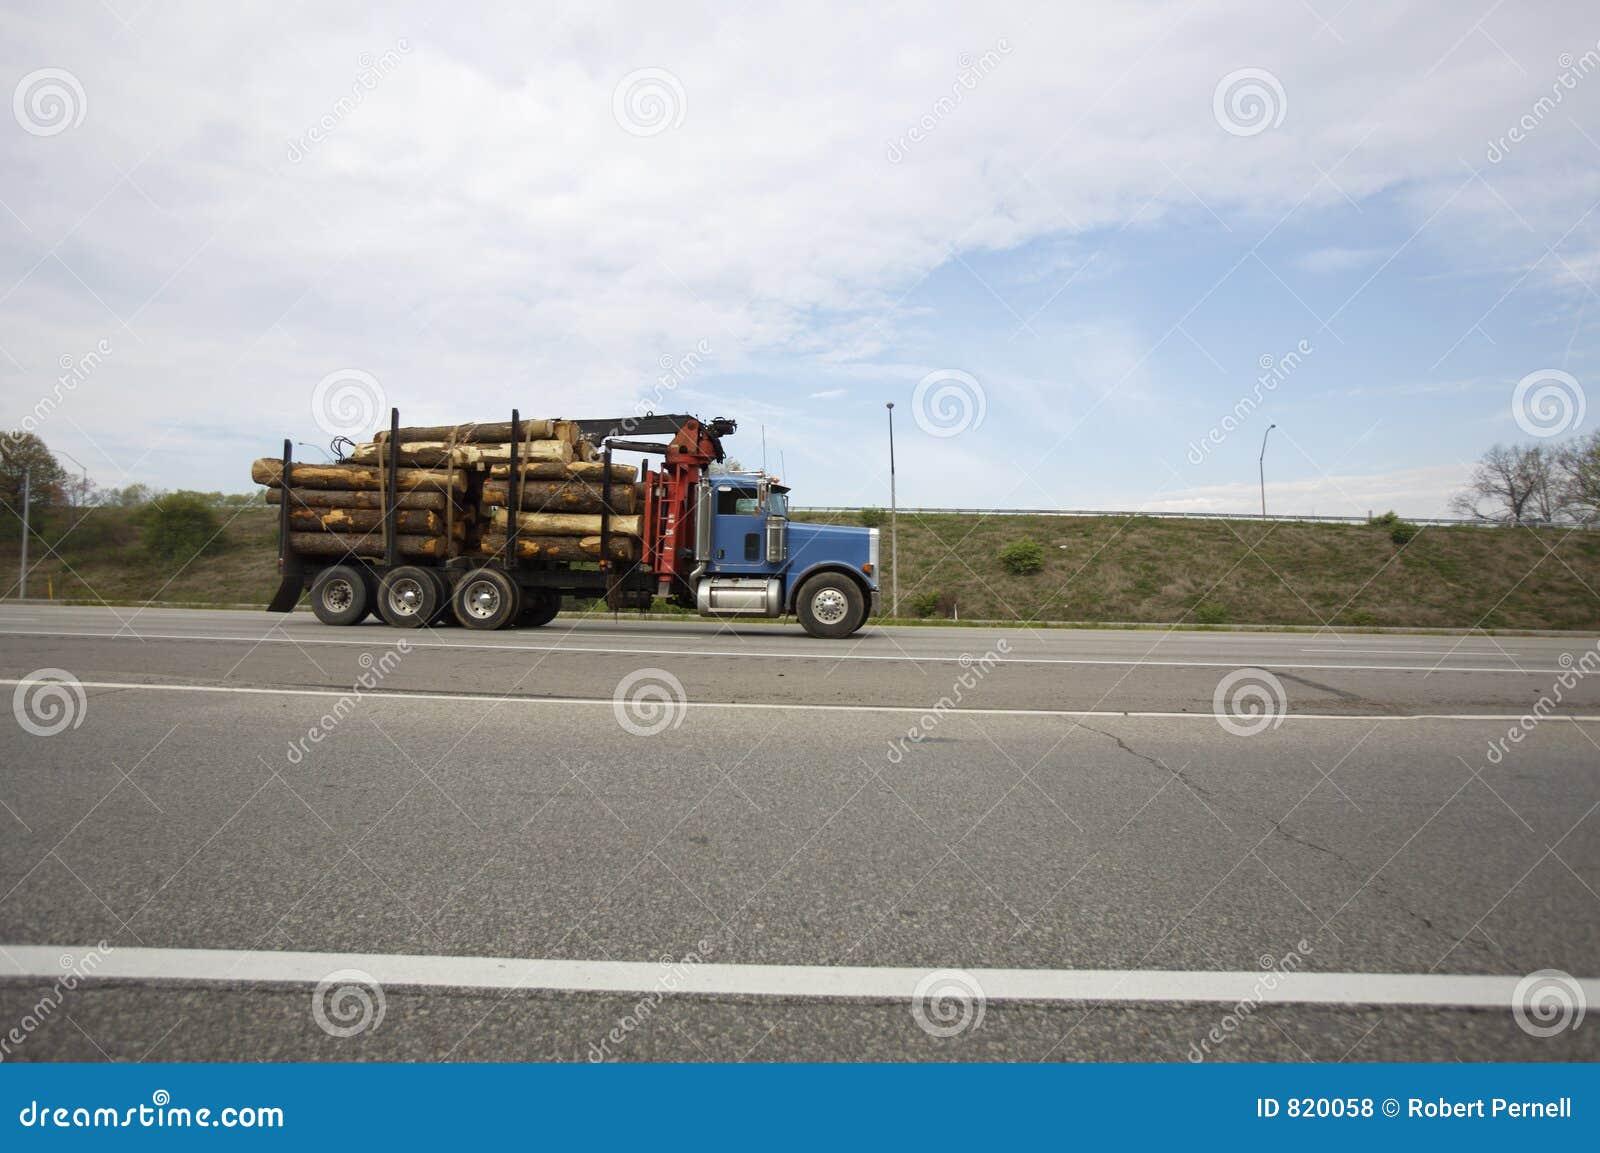 Skatalogowania ciężarówkę.